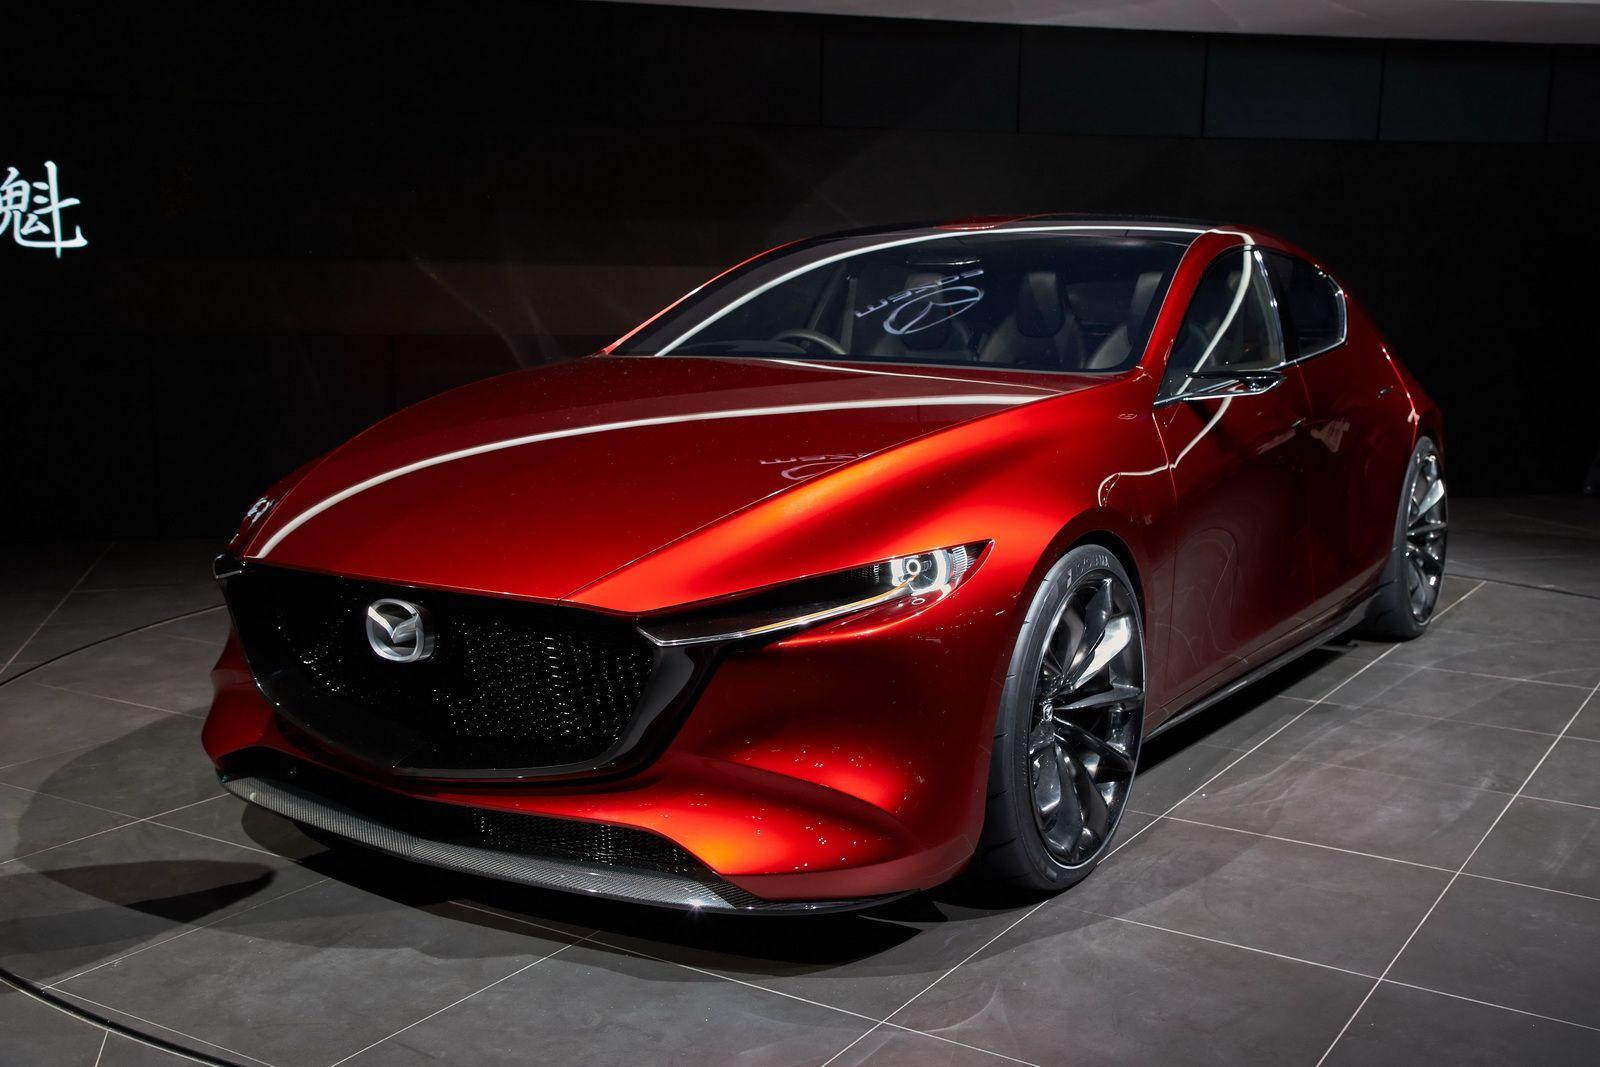 Pin on We Love Mazda's